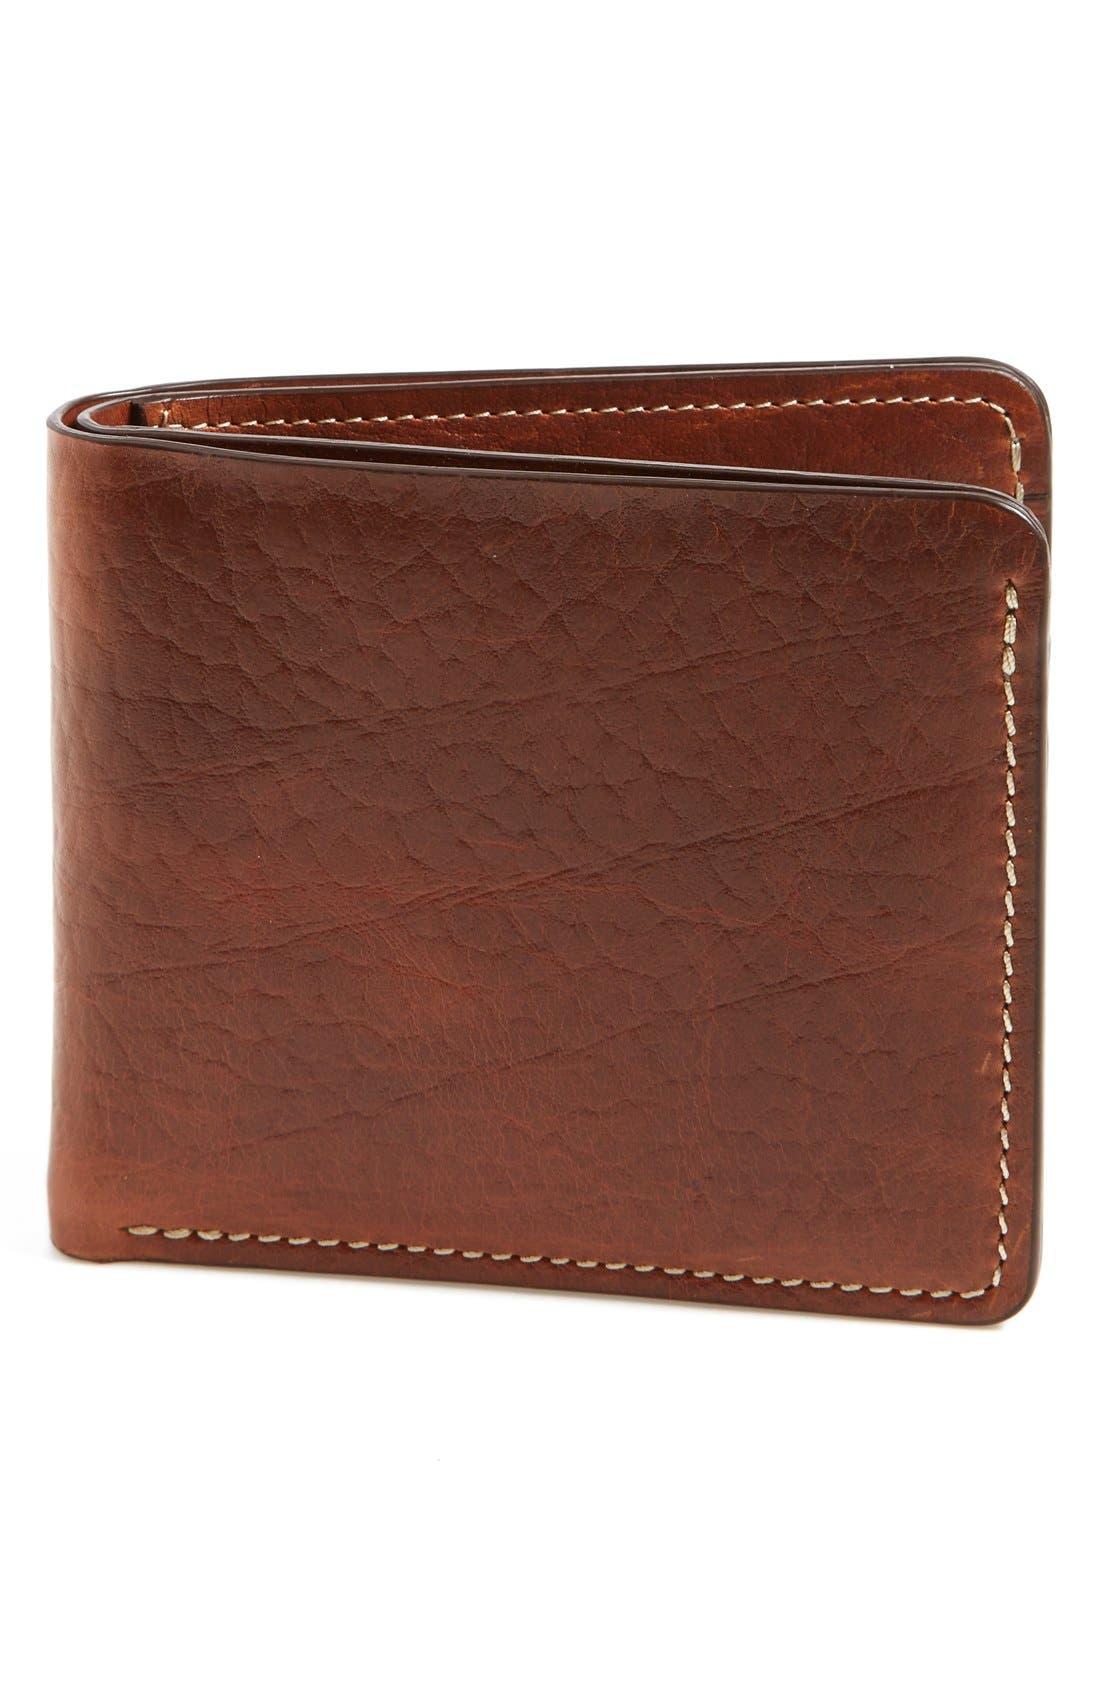 Main Image - Trask 'Jackson' Bison Leather Wallet